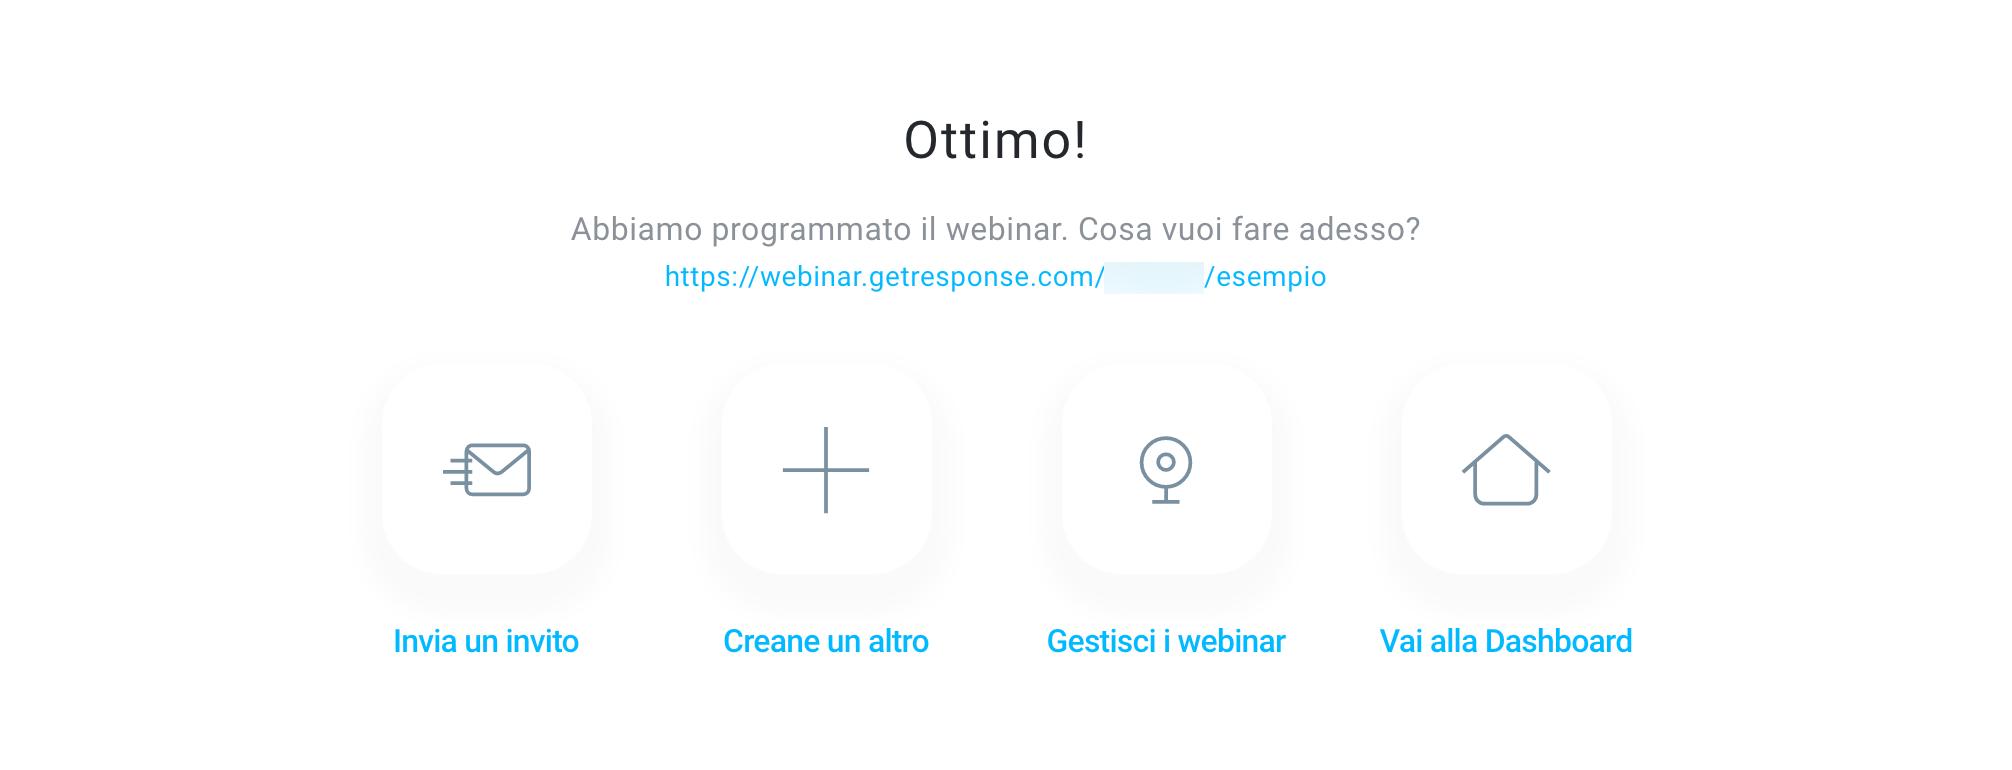 Webinar creato